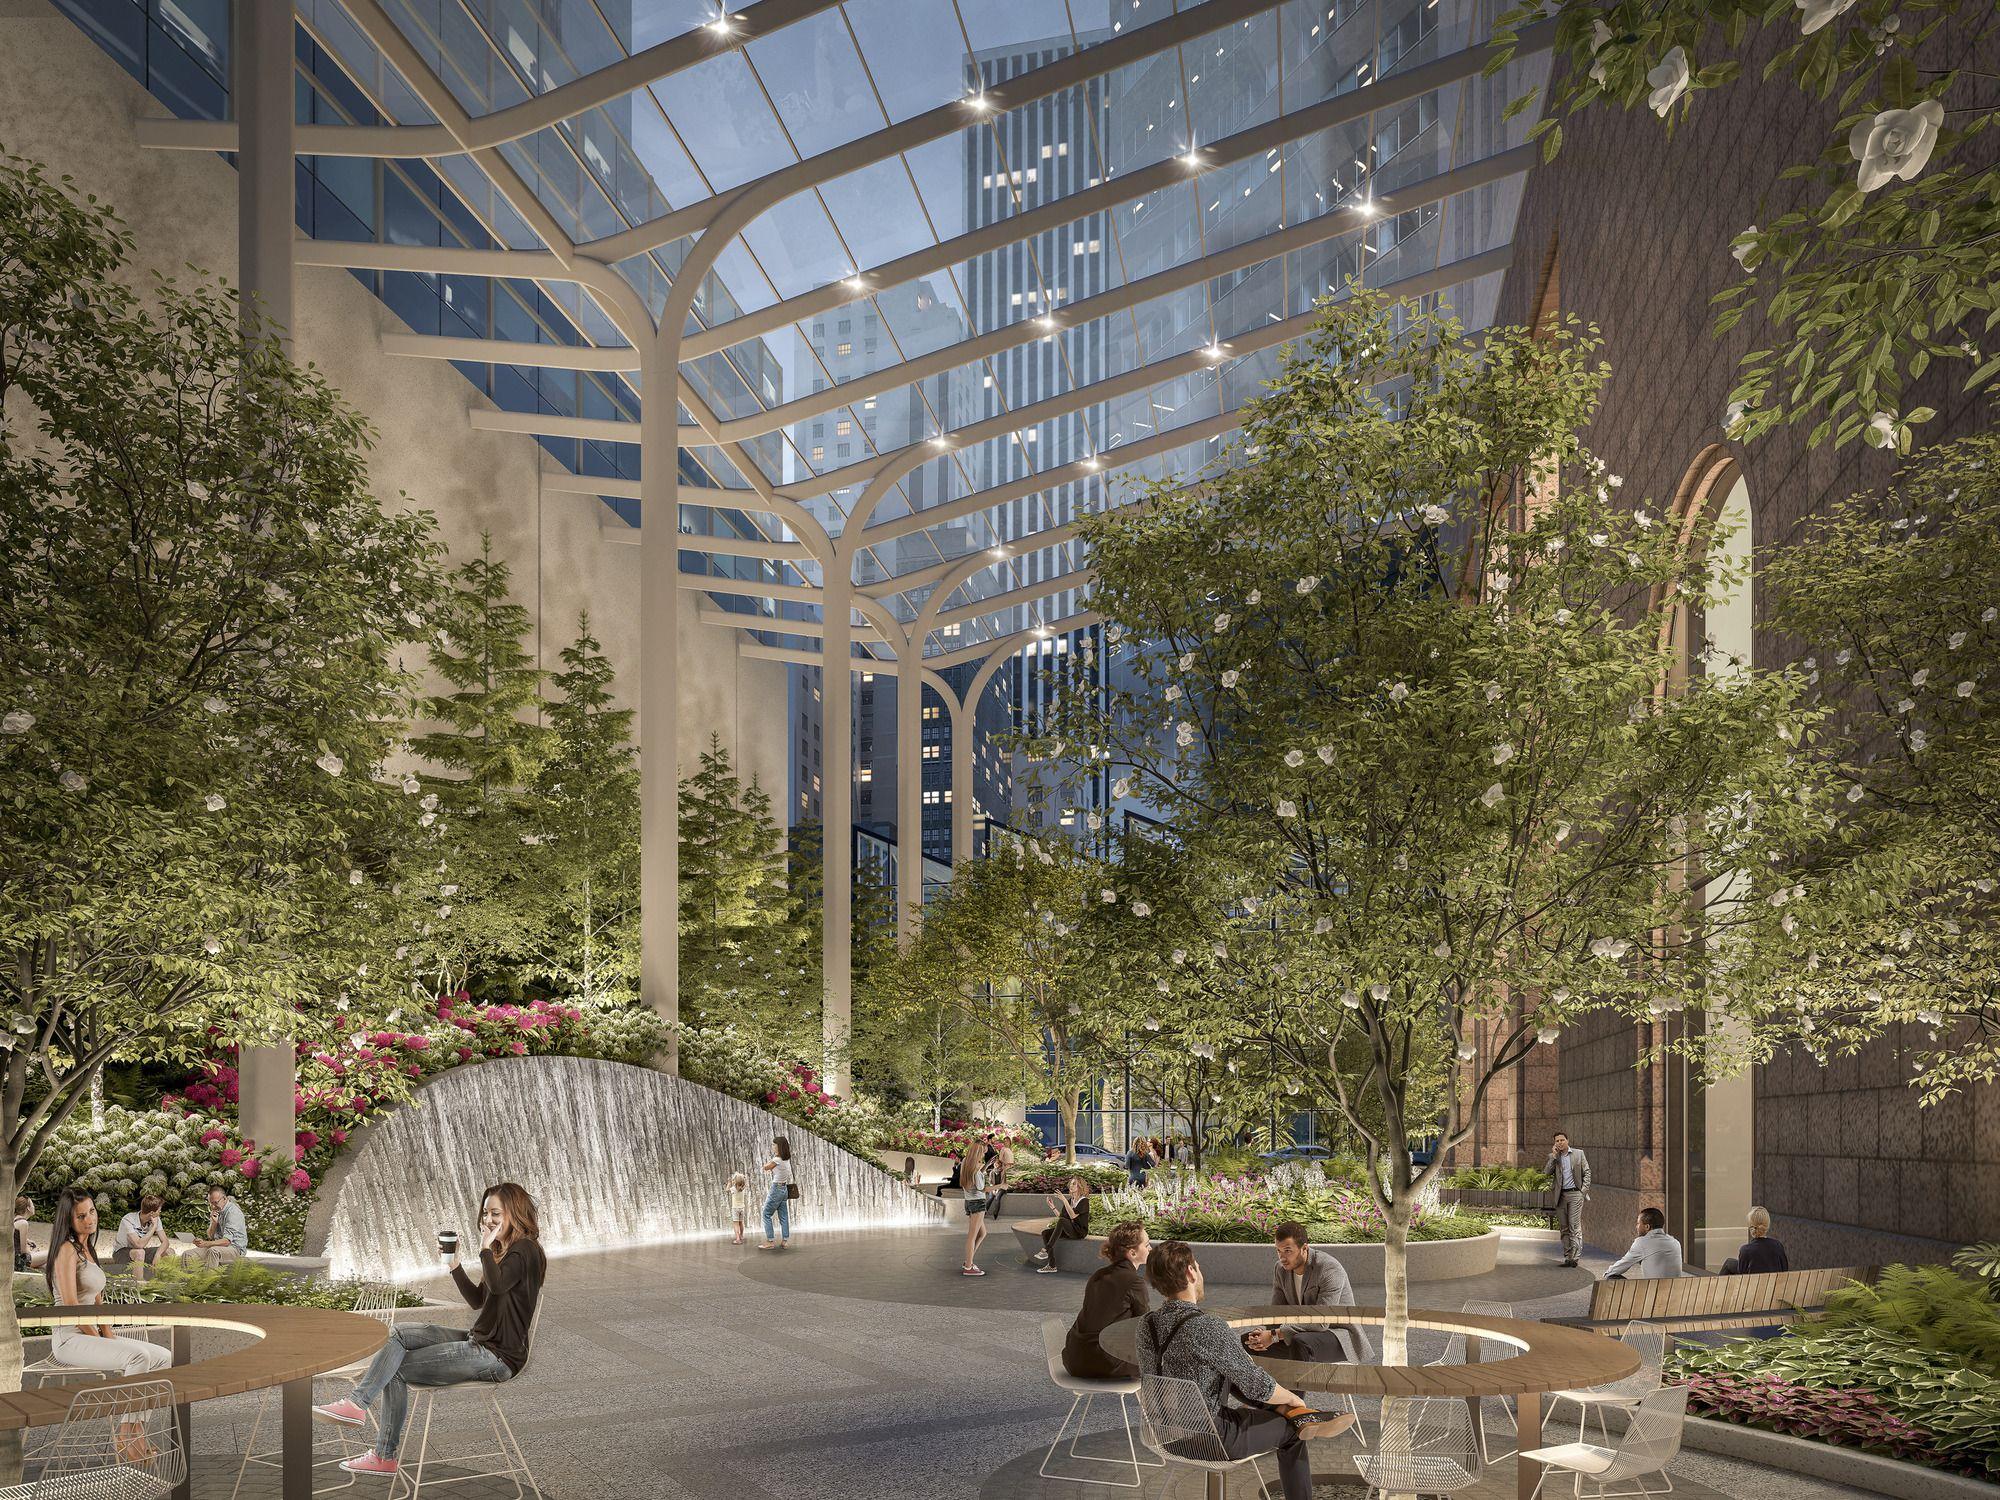 New York City Grants Approval for Snøhetta's 550 Madison